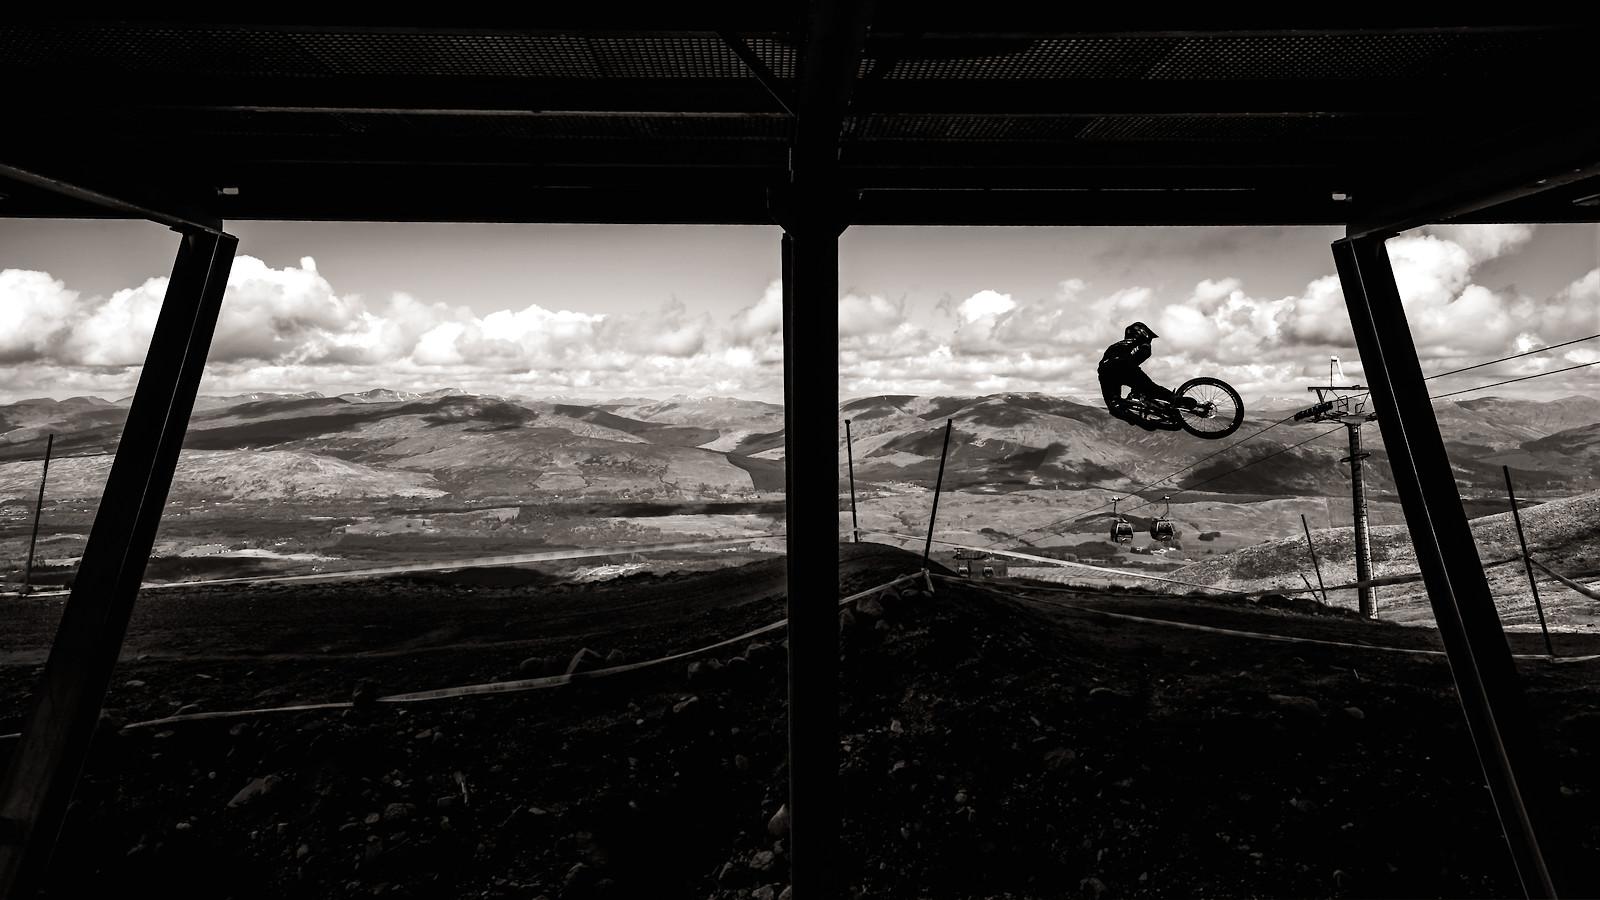 46323197195 1c794e8354 o - phunkt.com - Mountain Biking Pictures - Vital MTB